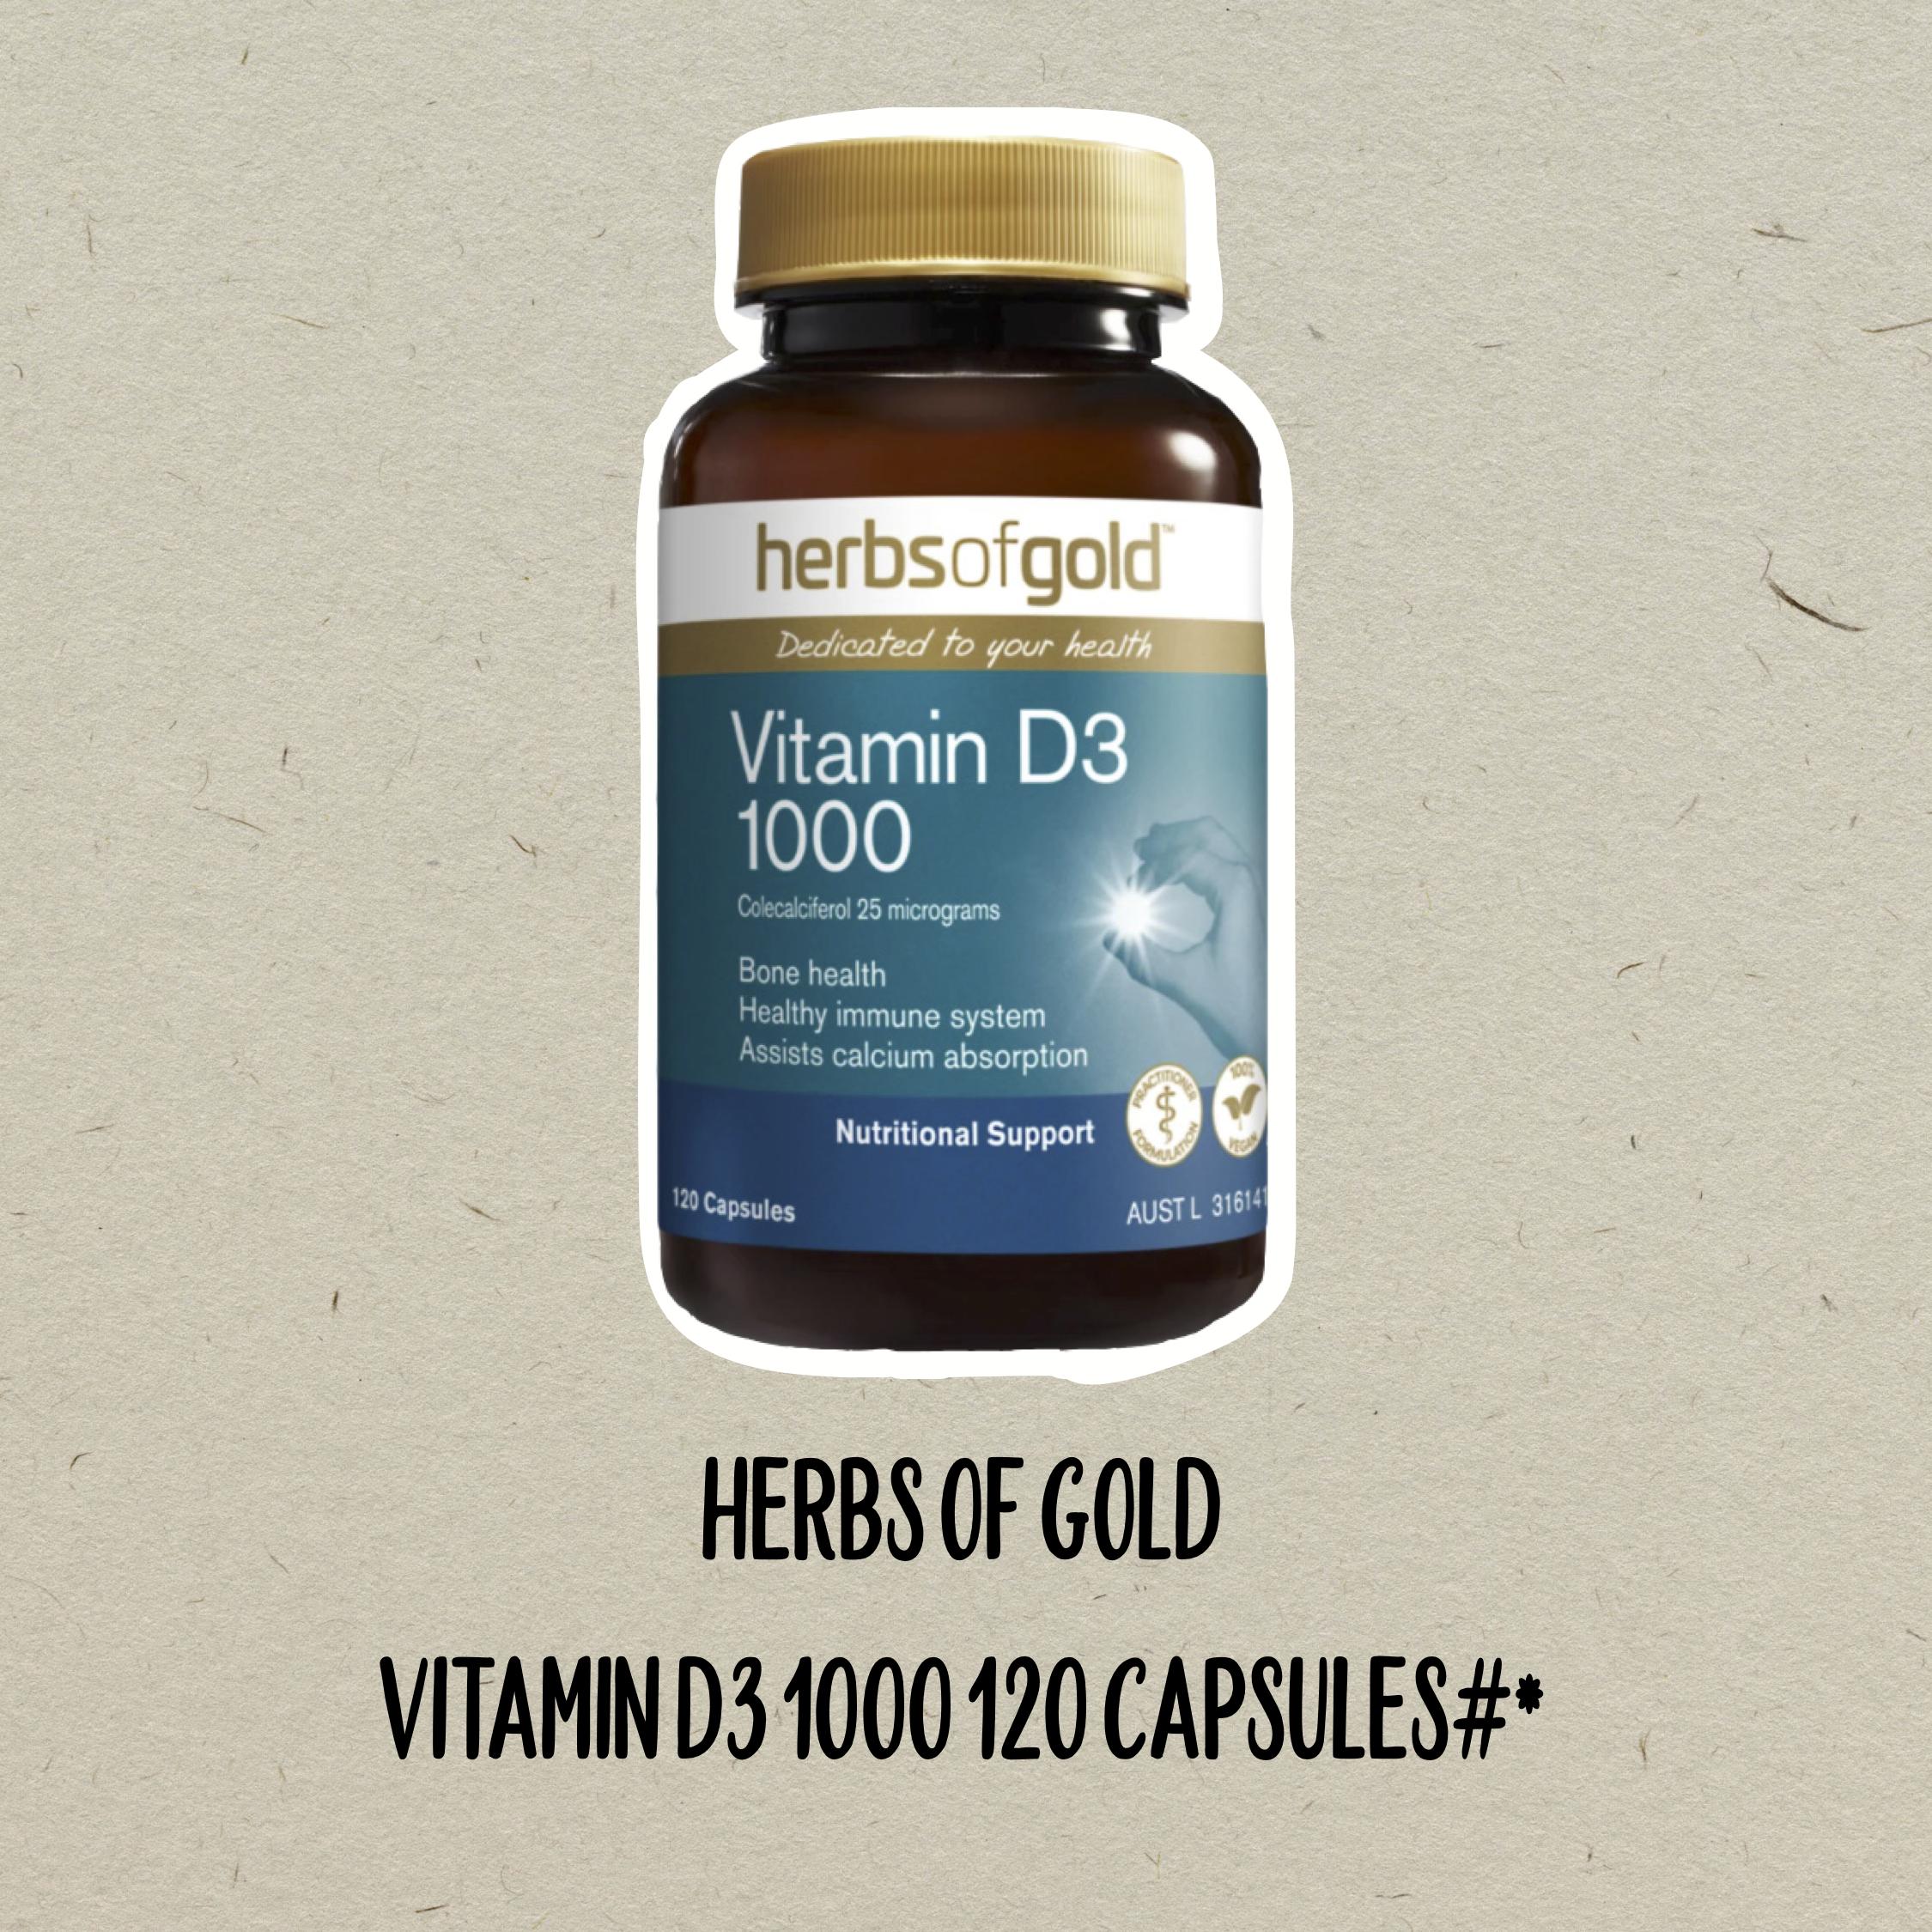 herbs of gold vitamin d3 1000 immunity